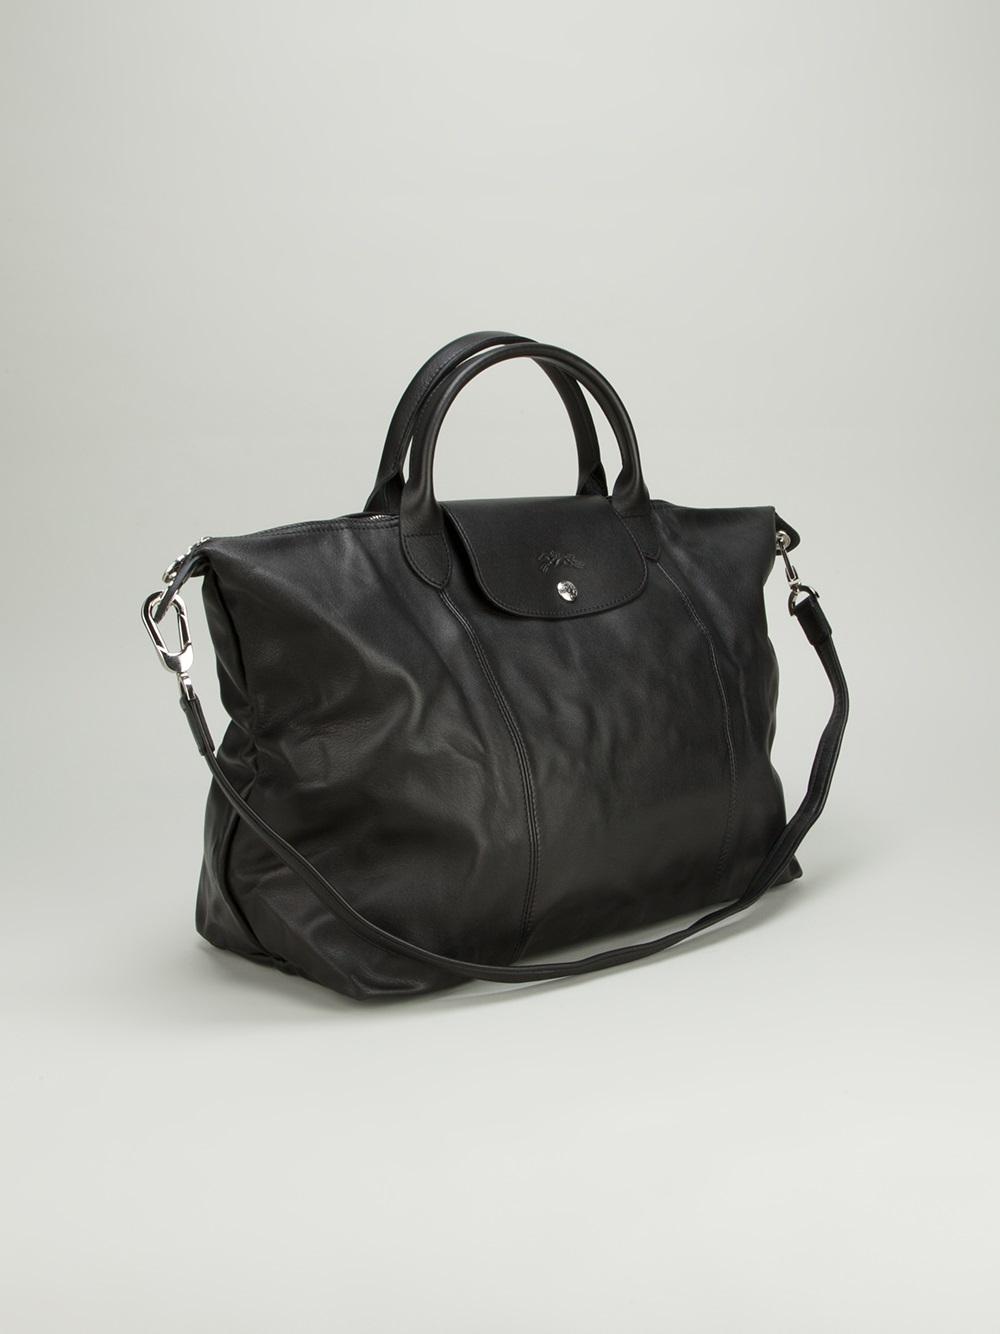 Longchamp Le Pliage Cuir Tote in Black - Lyst 767ecd33359c7